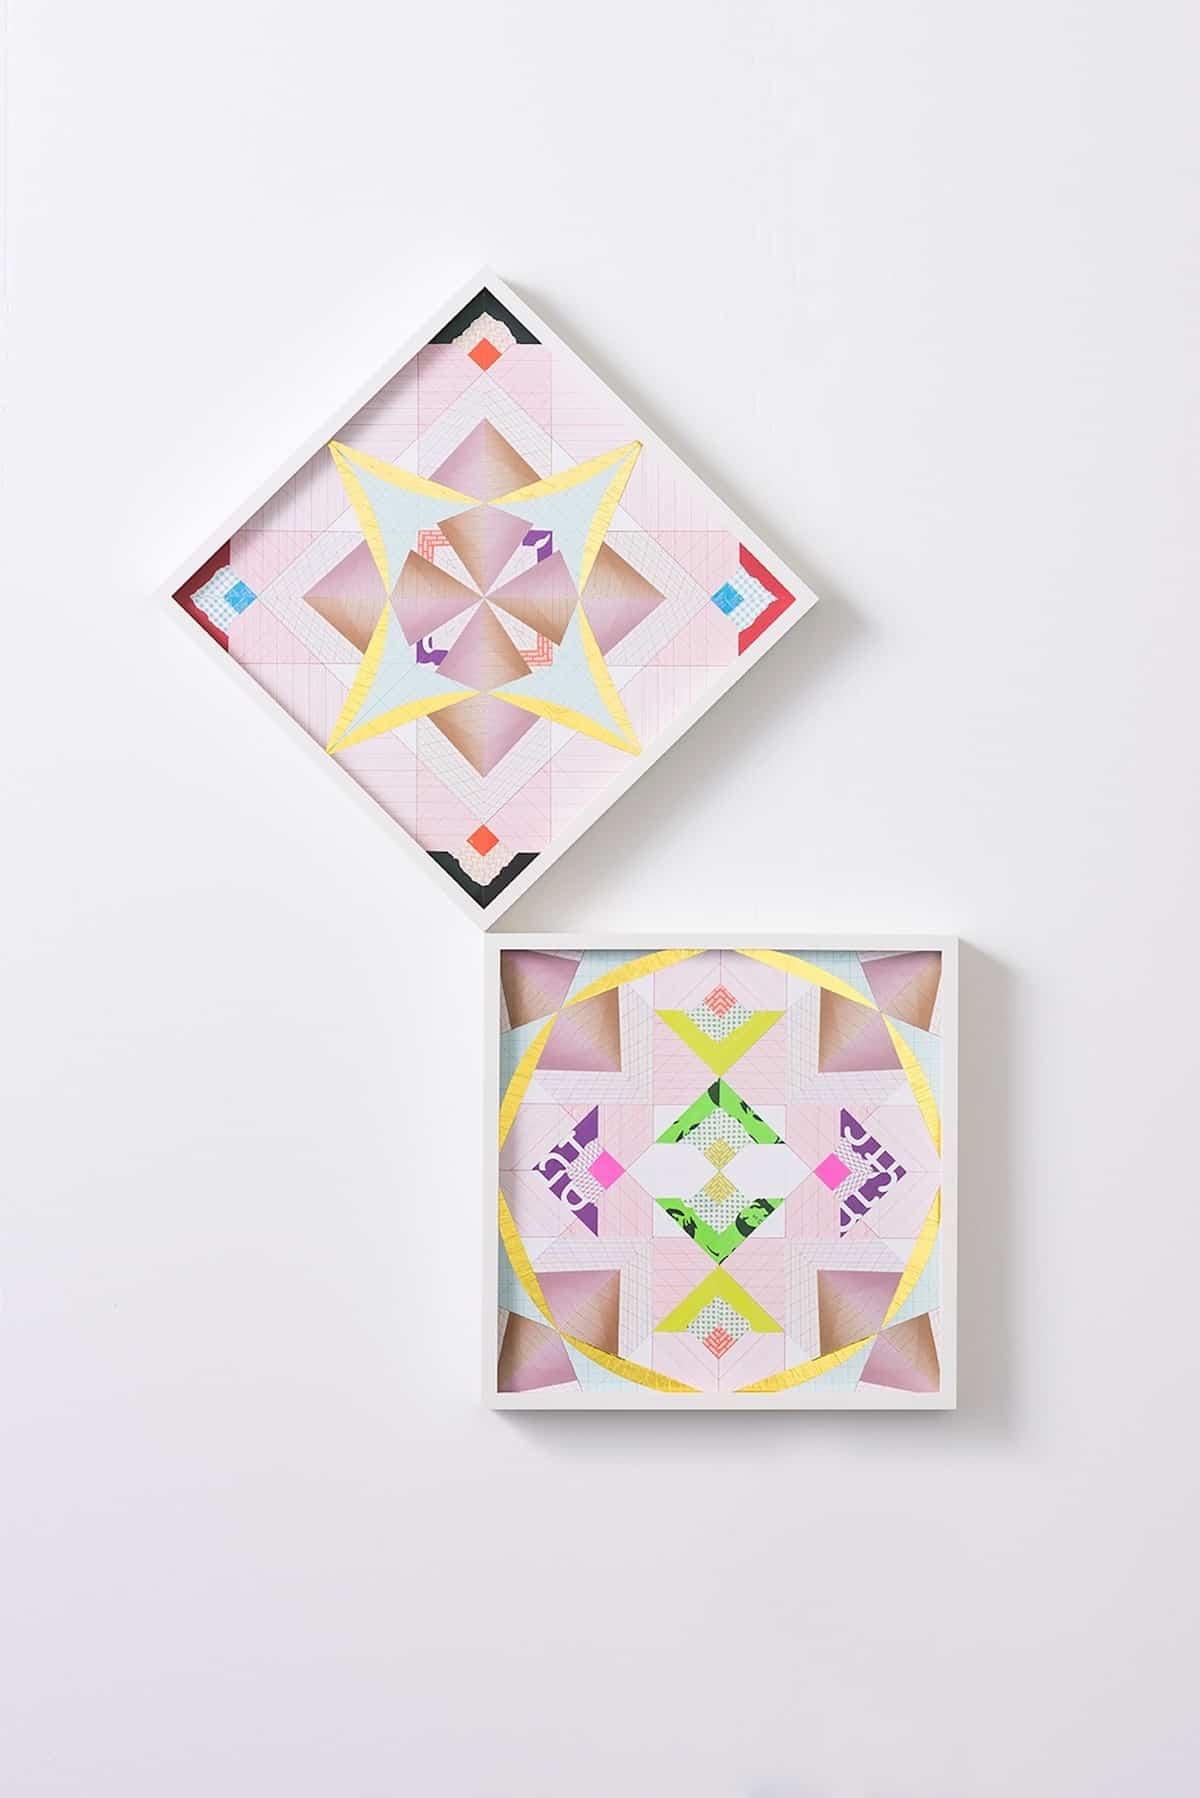 haegue-yang-minuscule-kaleidoscopic-clock-faces-trustworthy-322